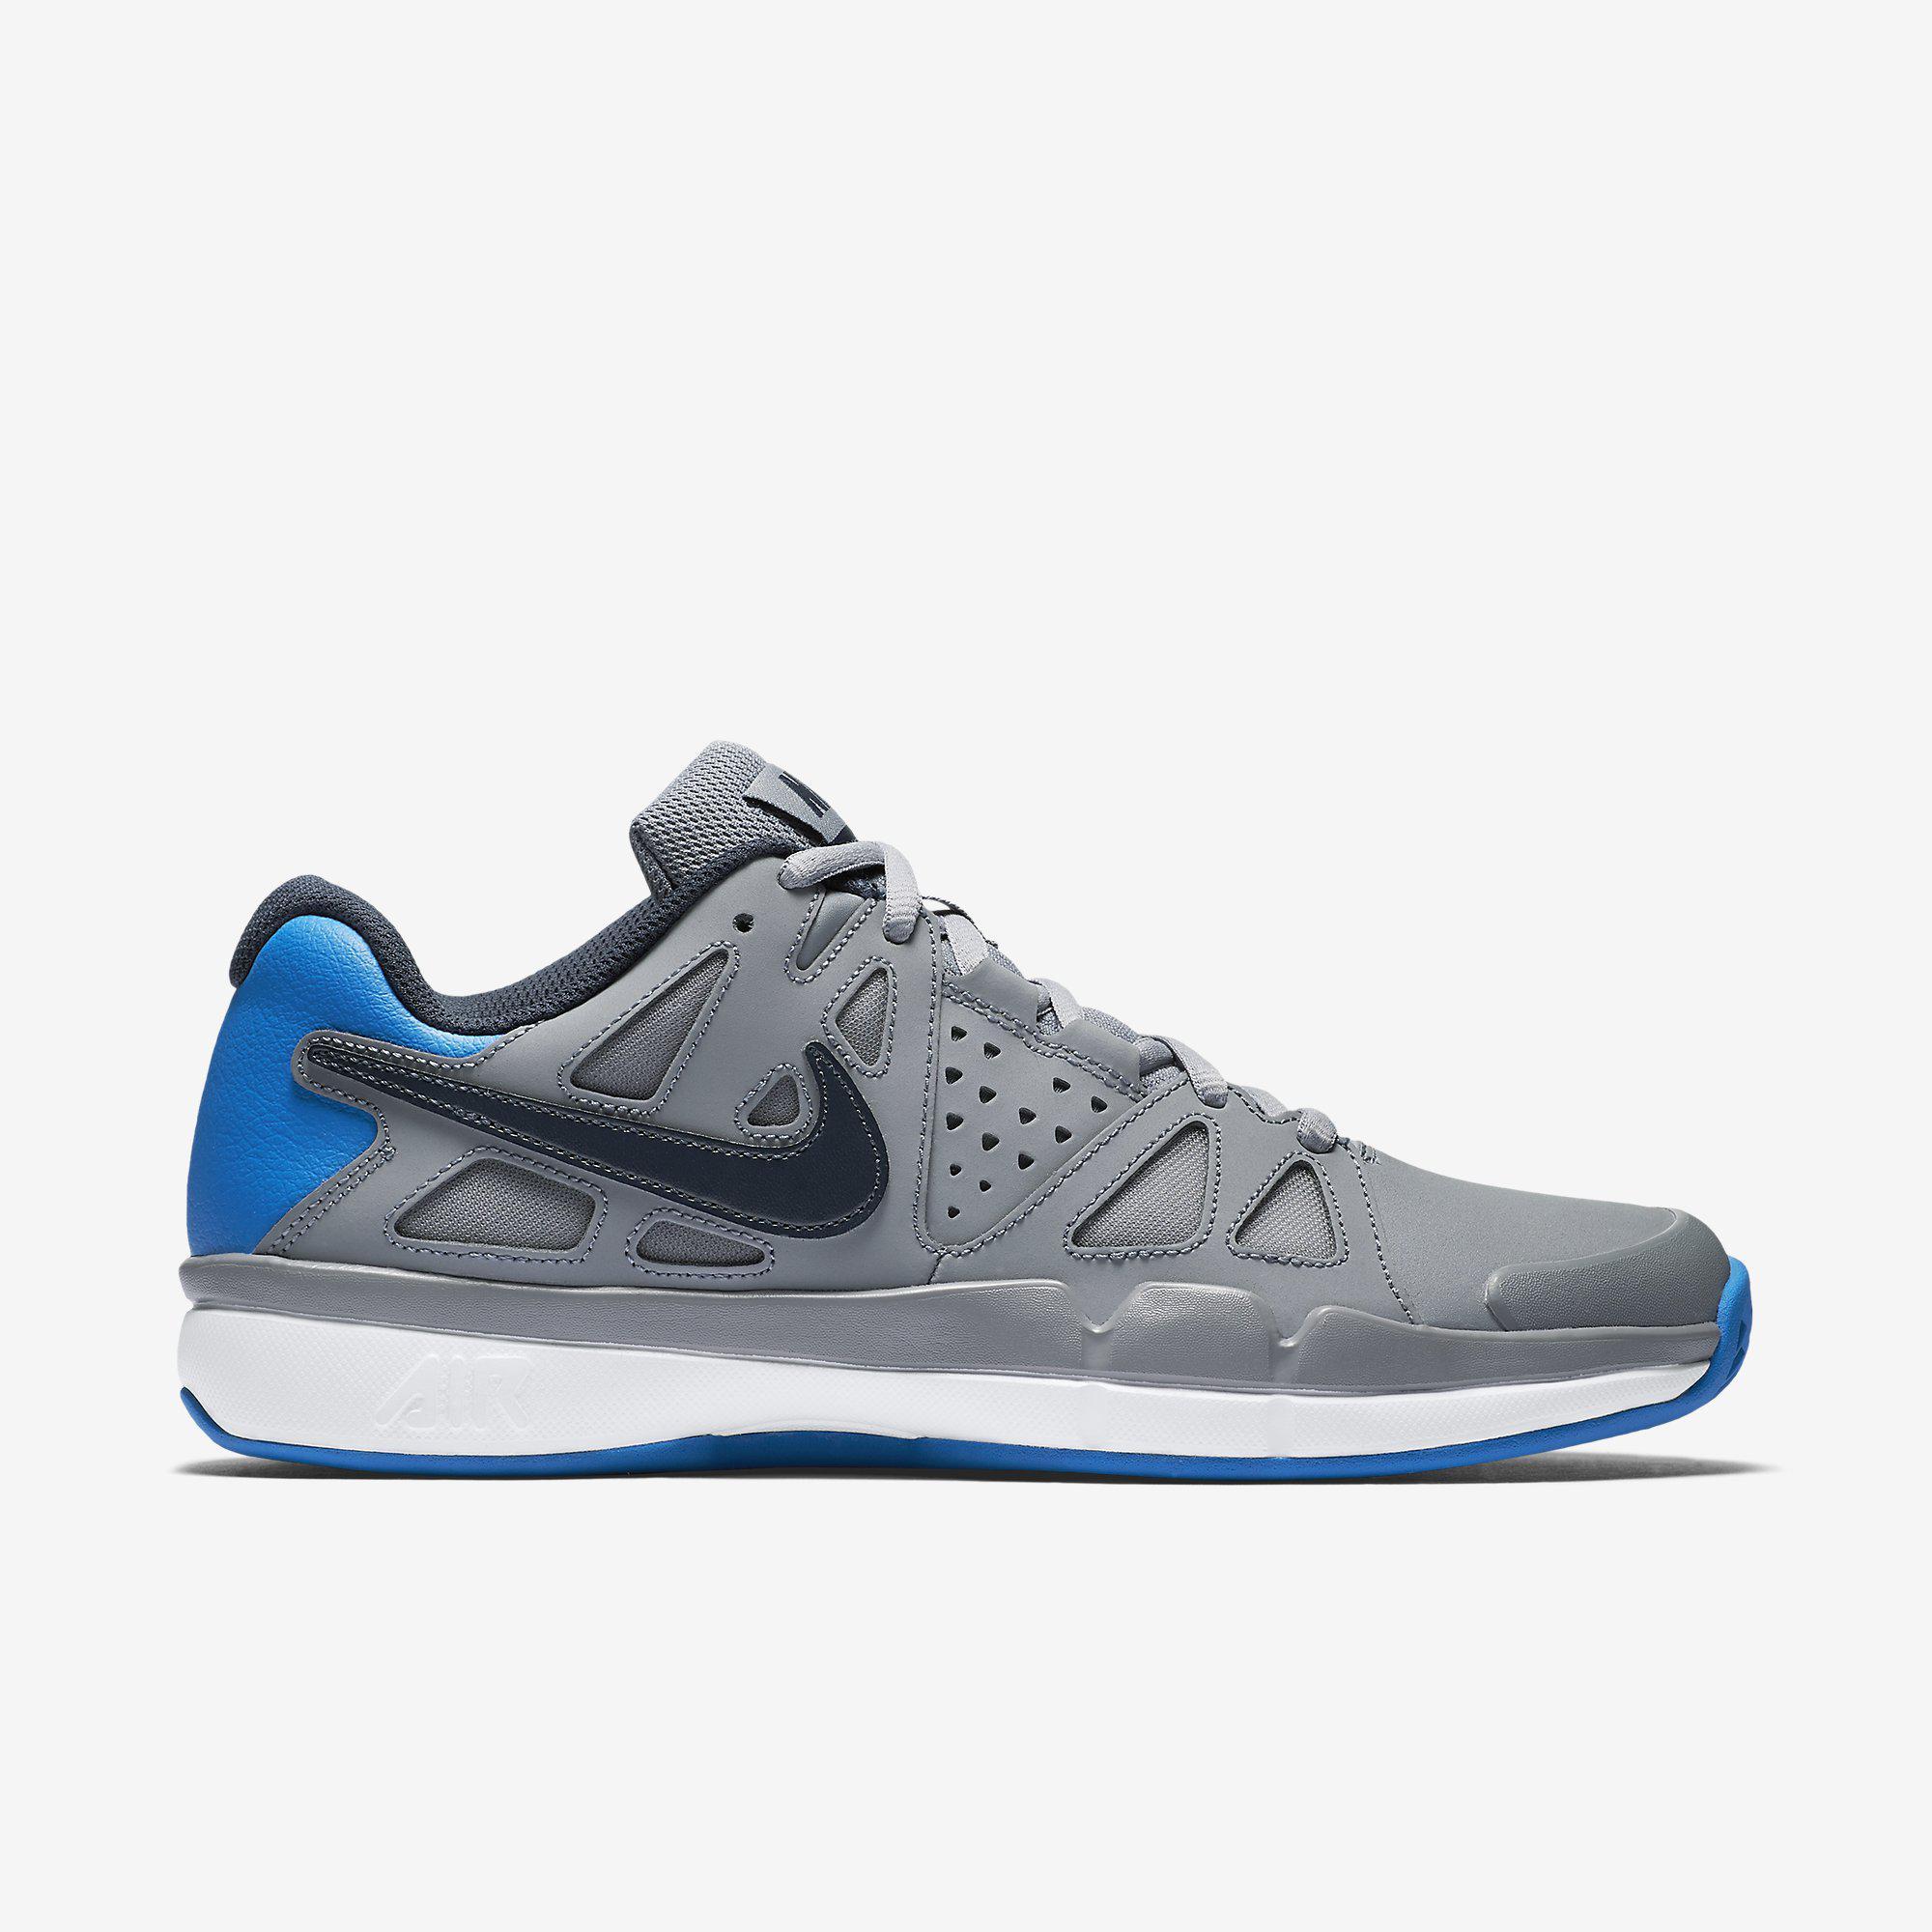 Nike Mens Air Vapor Advantage Clay Court Tennis Shoes - Grey -  Tennisnuts.com 1f0869d72